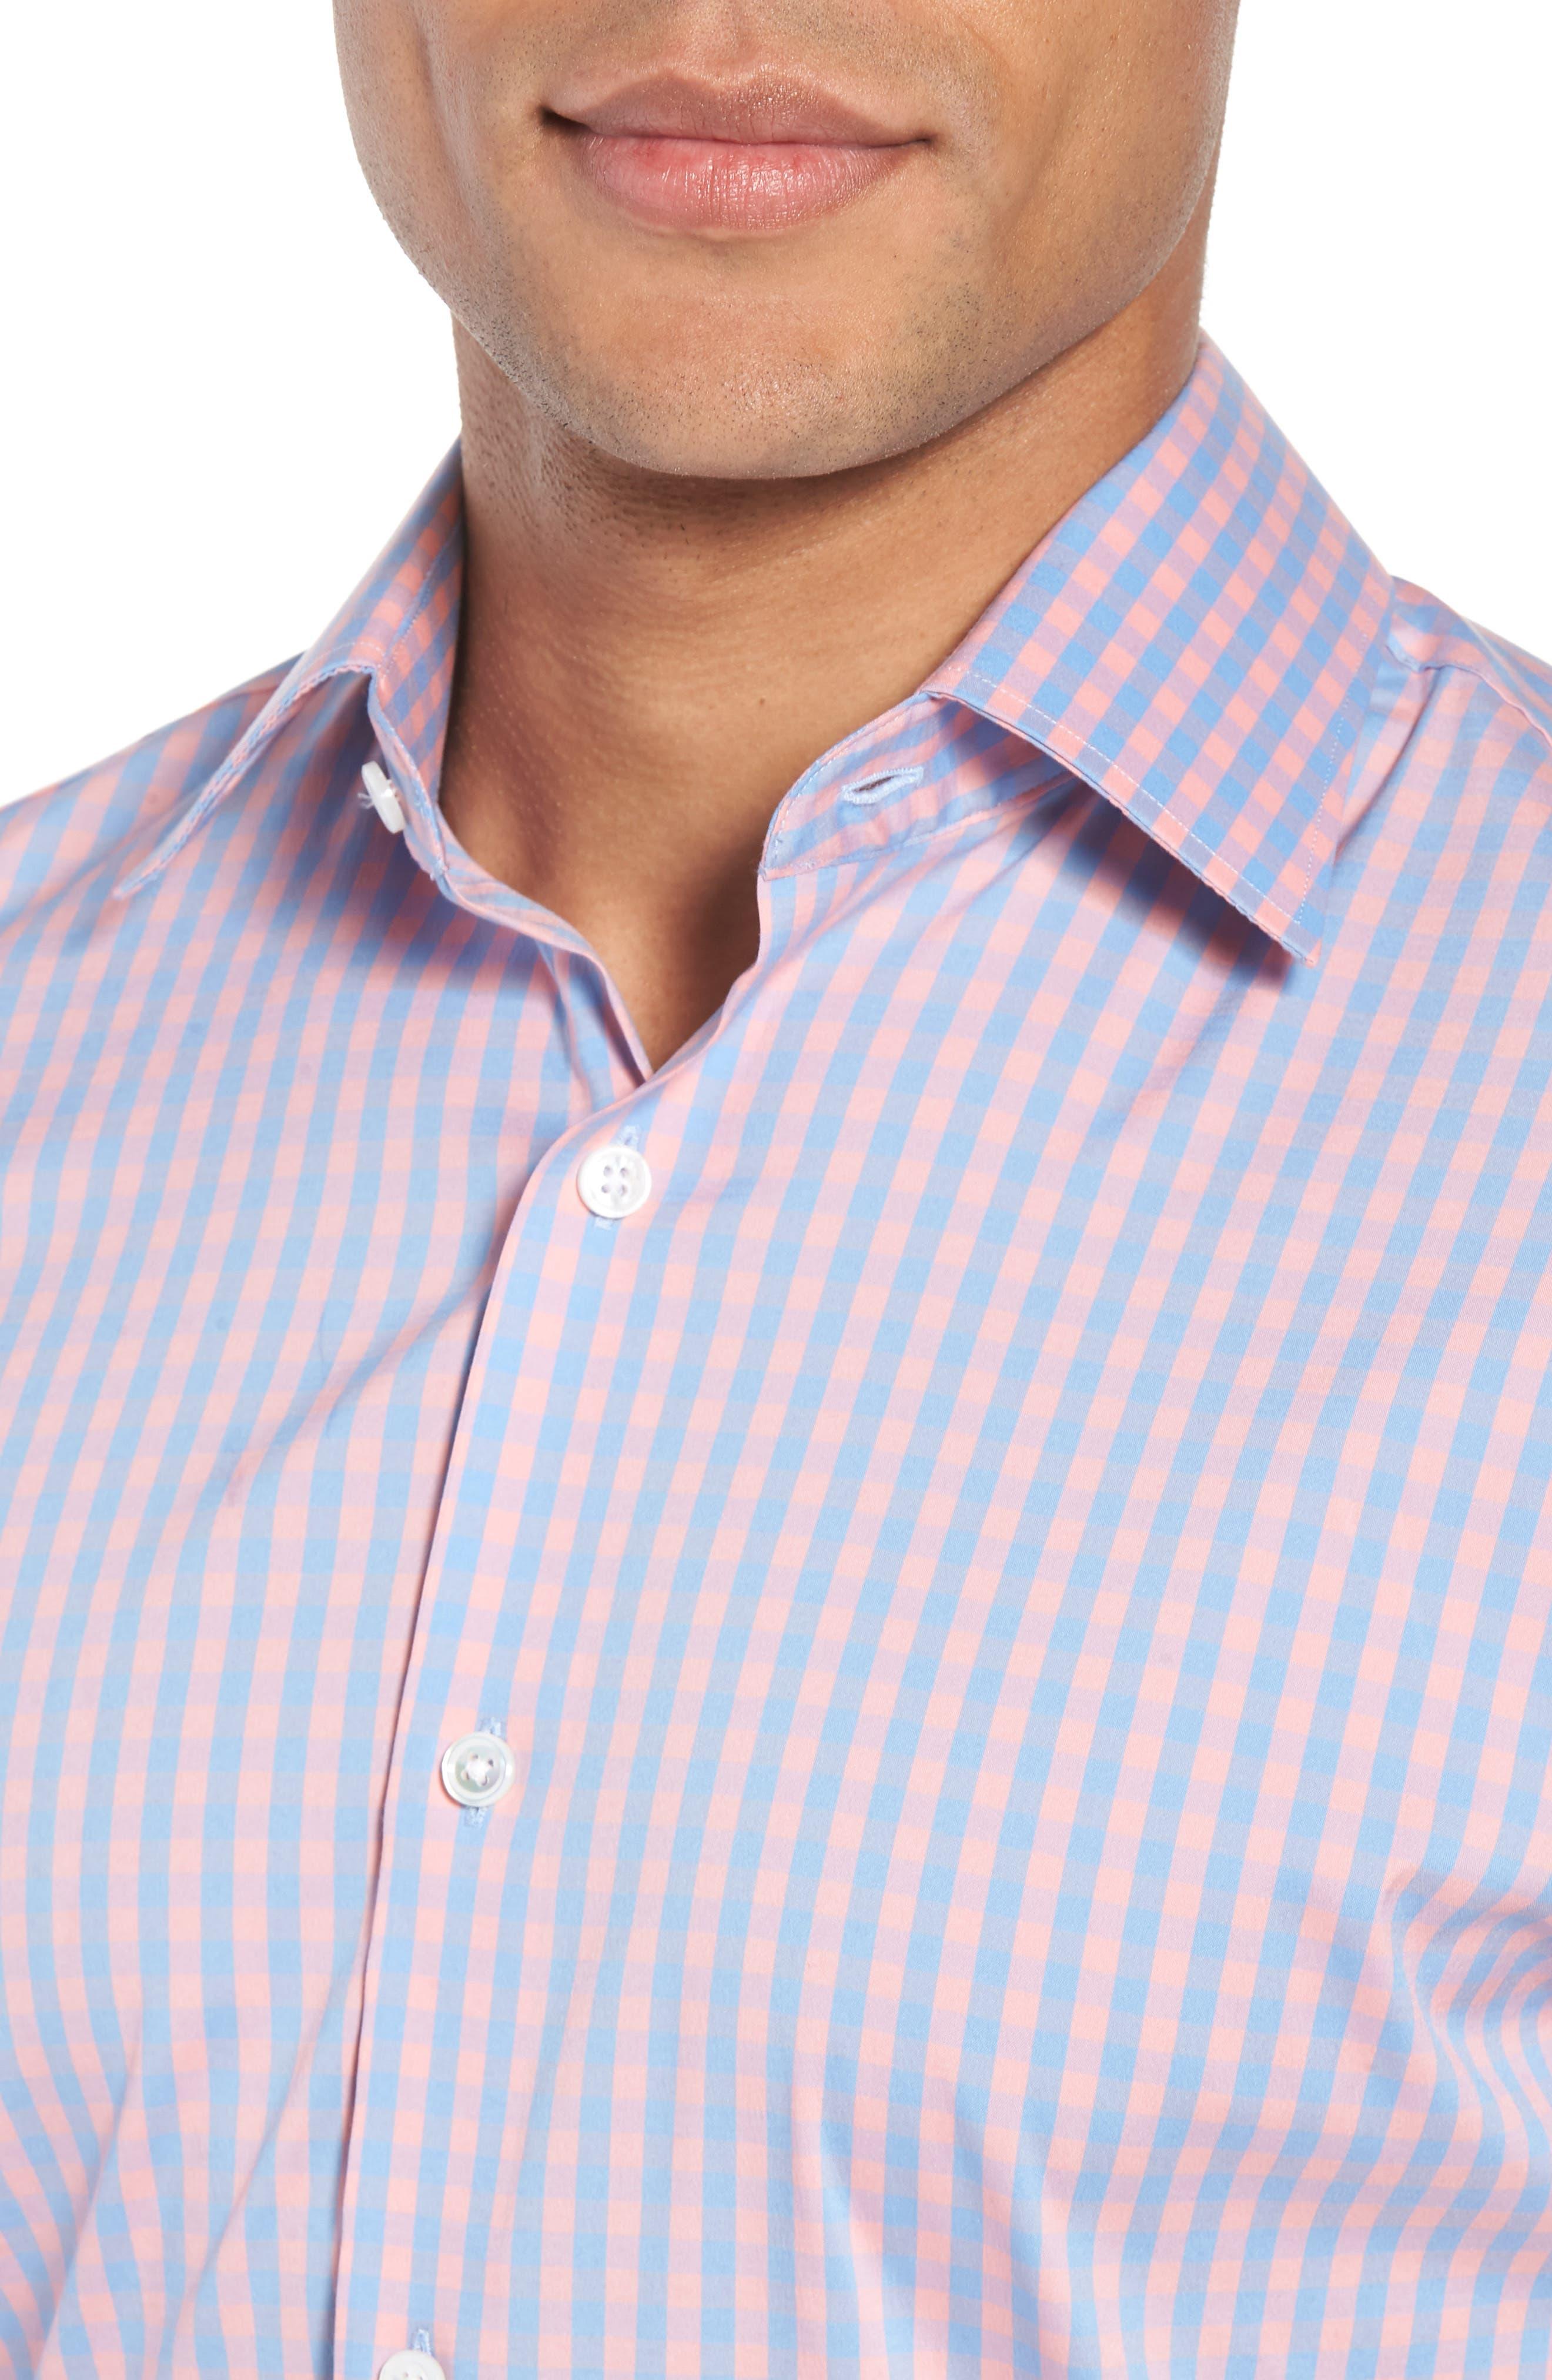 Jetsetter Slim Fit Stretch Check Dress Shirt,                             Alternate thumbnail 2, color,